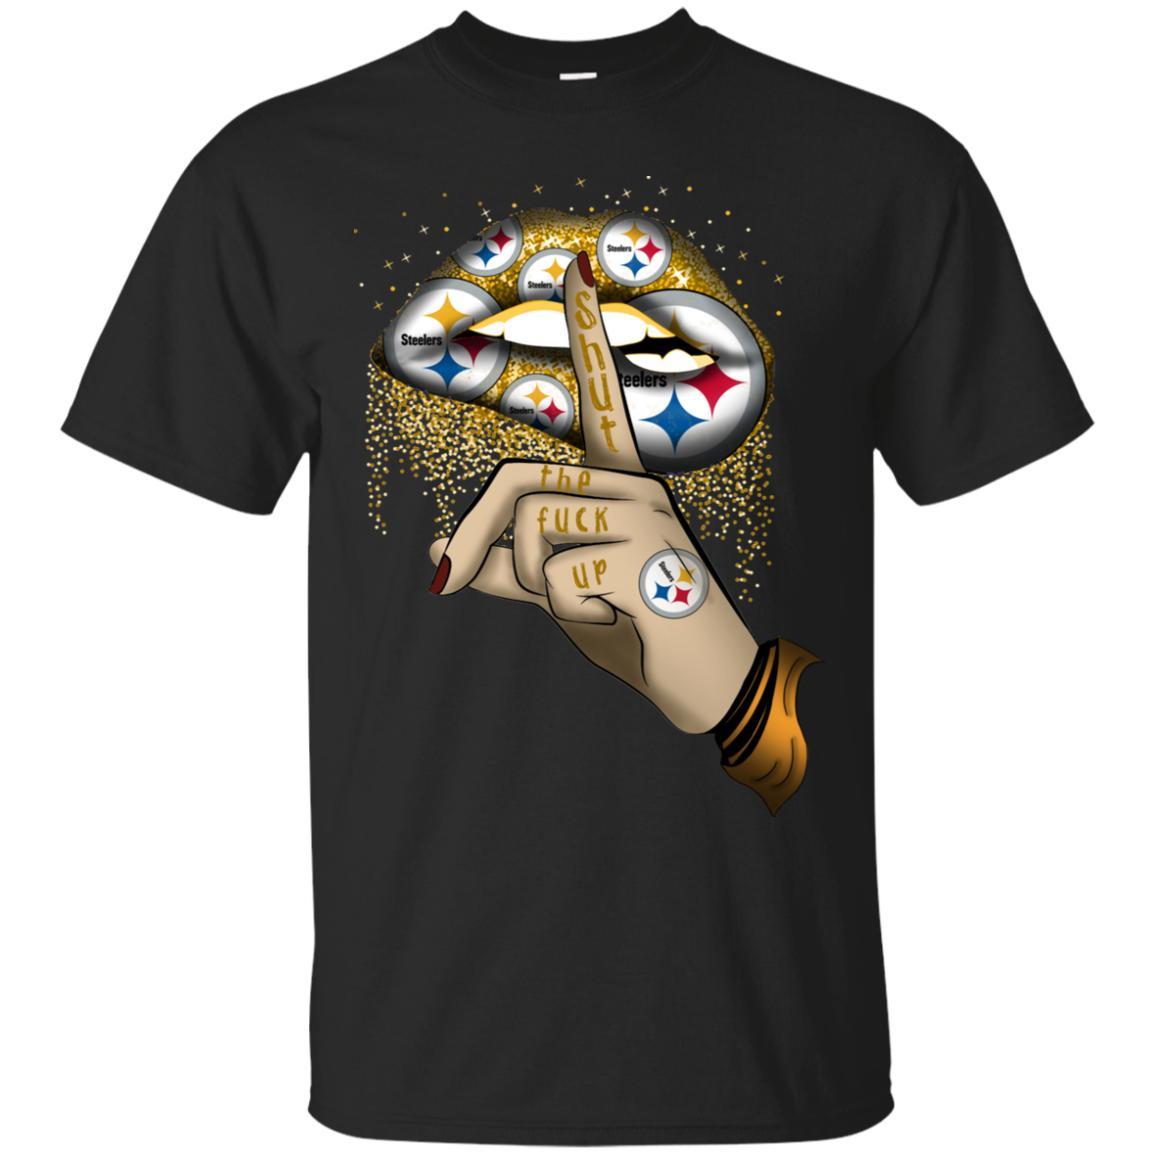 Steelers lips – Shut the fuck up T-Shirt